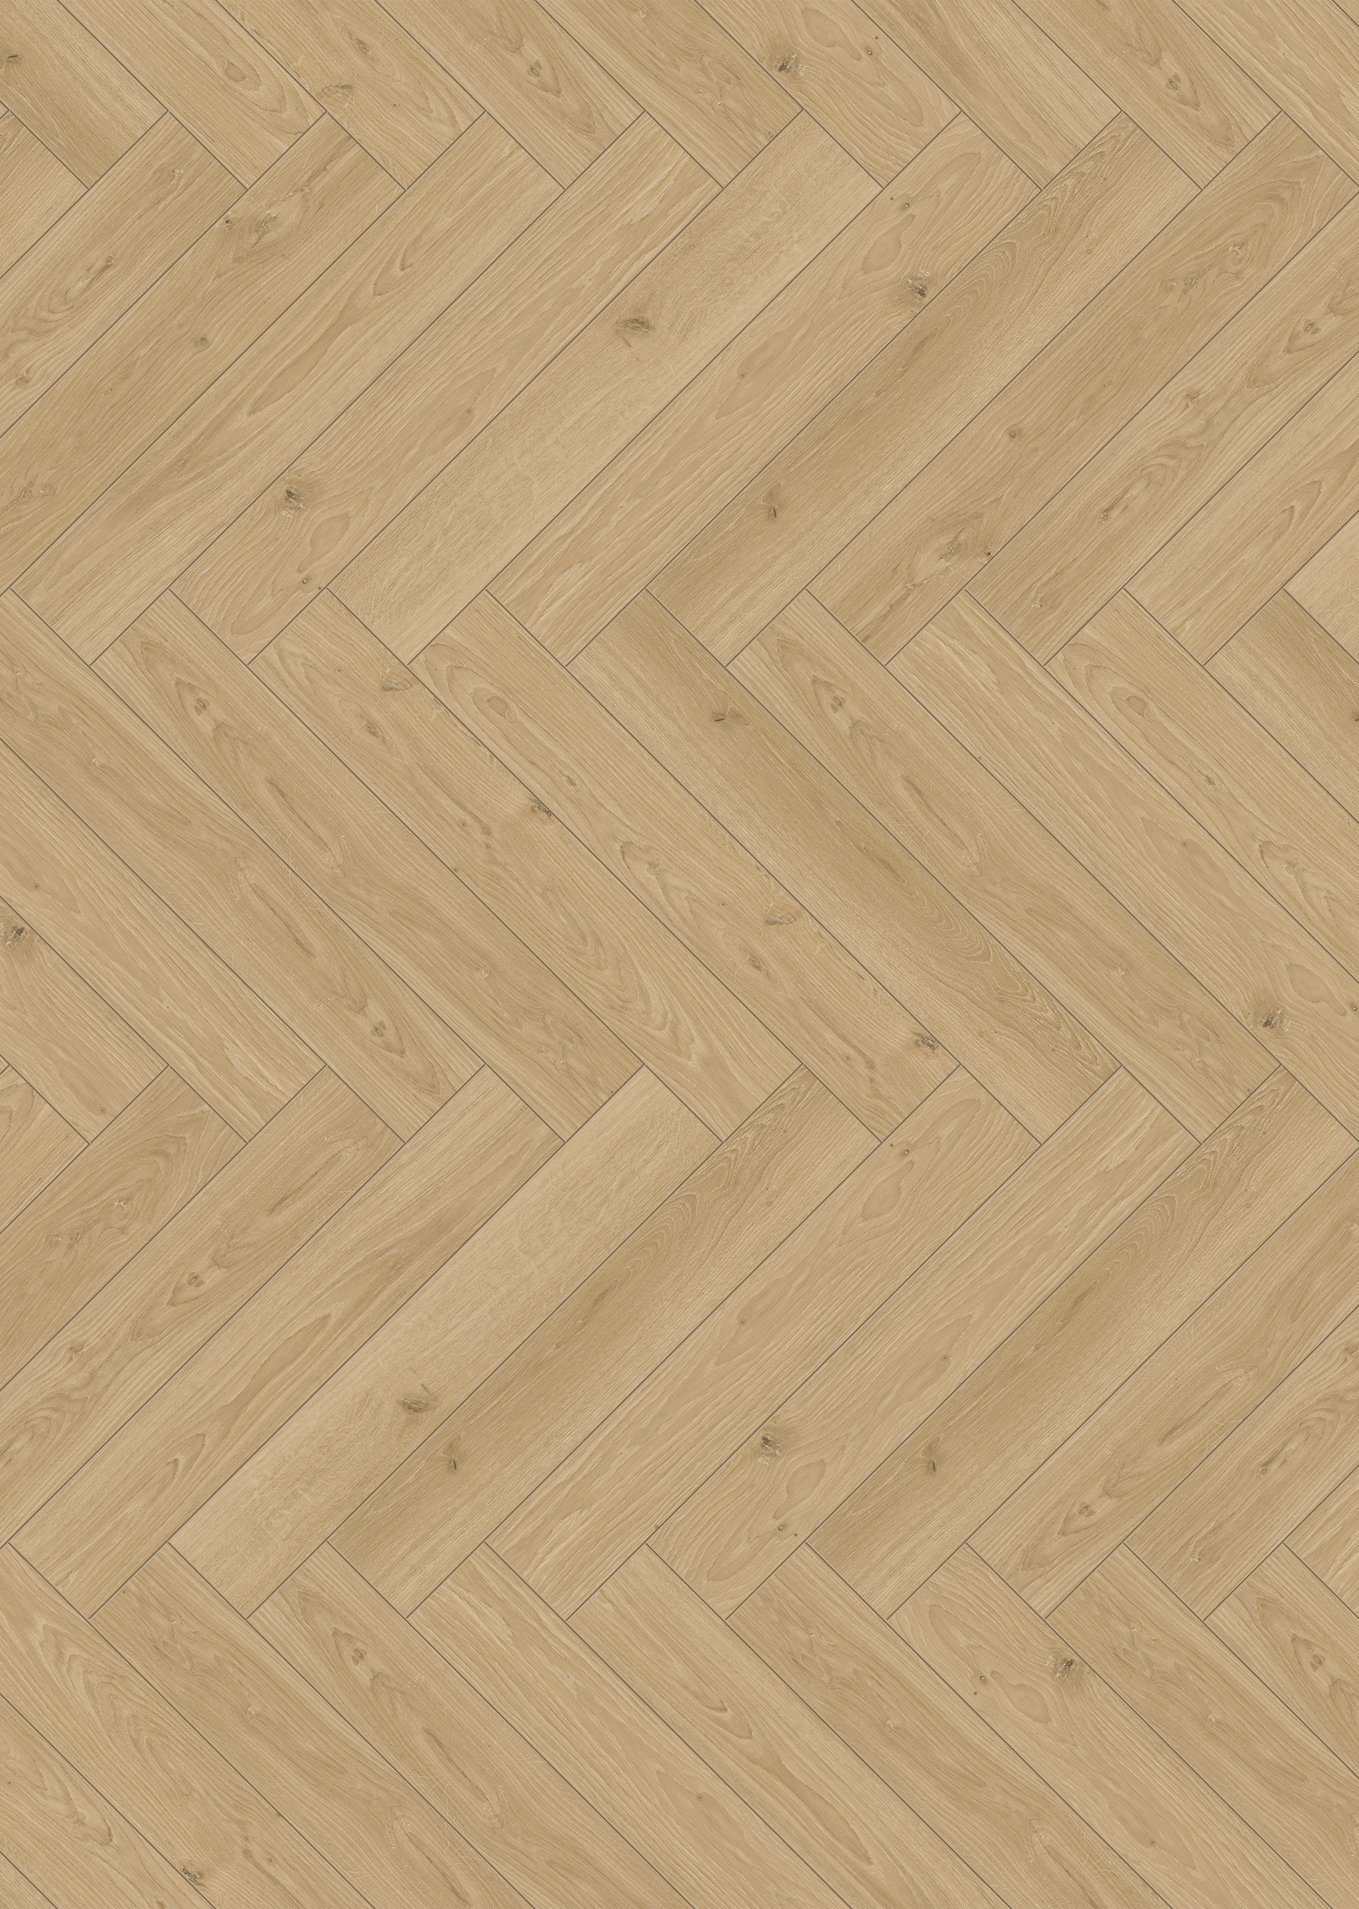 PARADOR Laminat »Trendtime 3 - Eiche Studioline«, 858 x 143 mm, Stärke: 8 mm